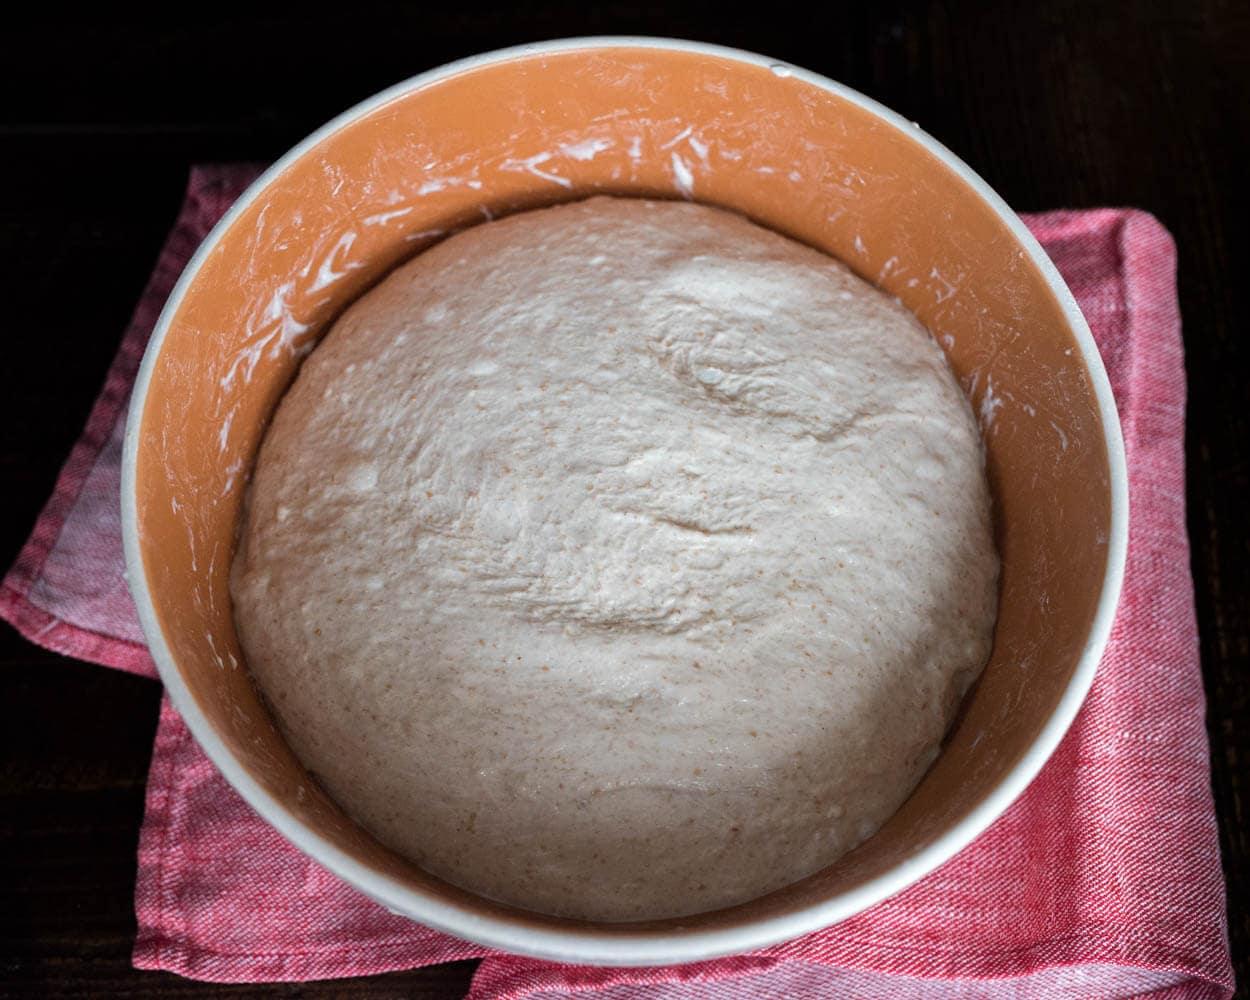 Bulk fermentation after third stretch and fold